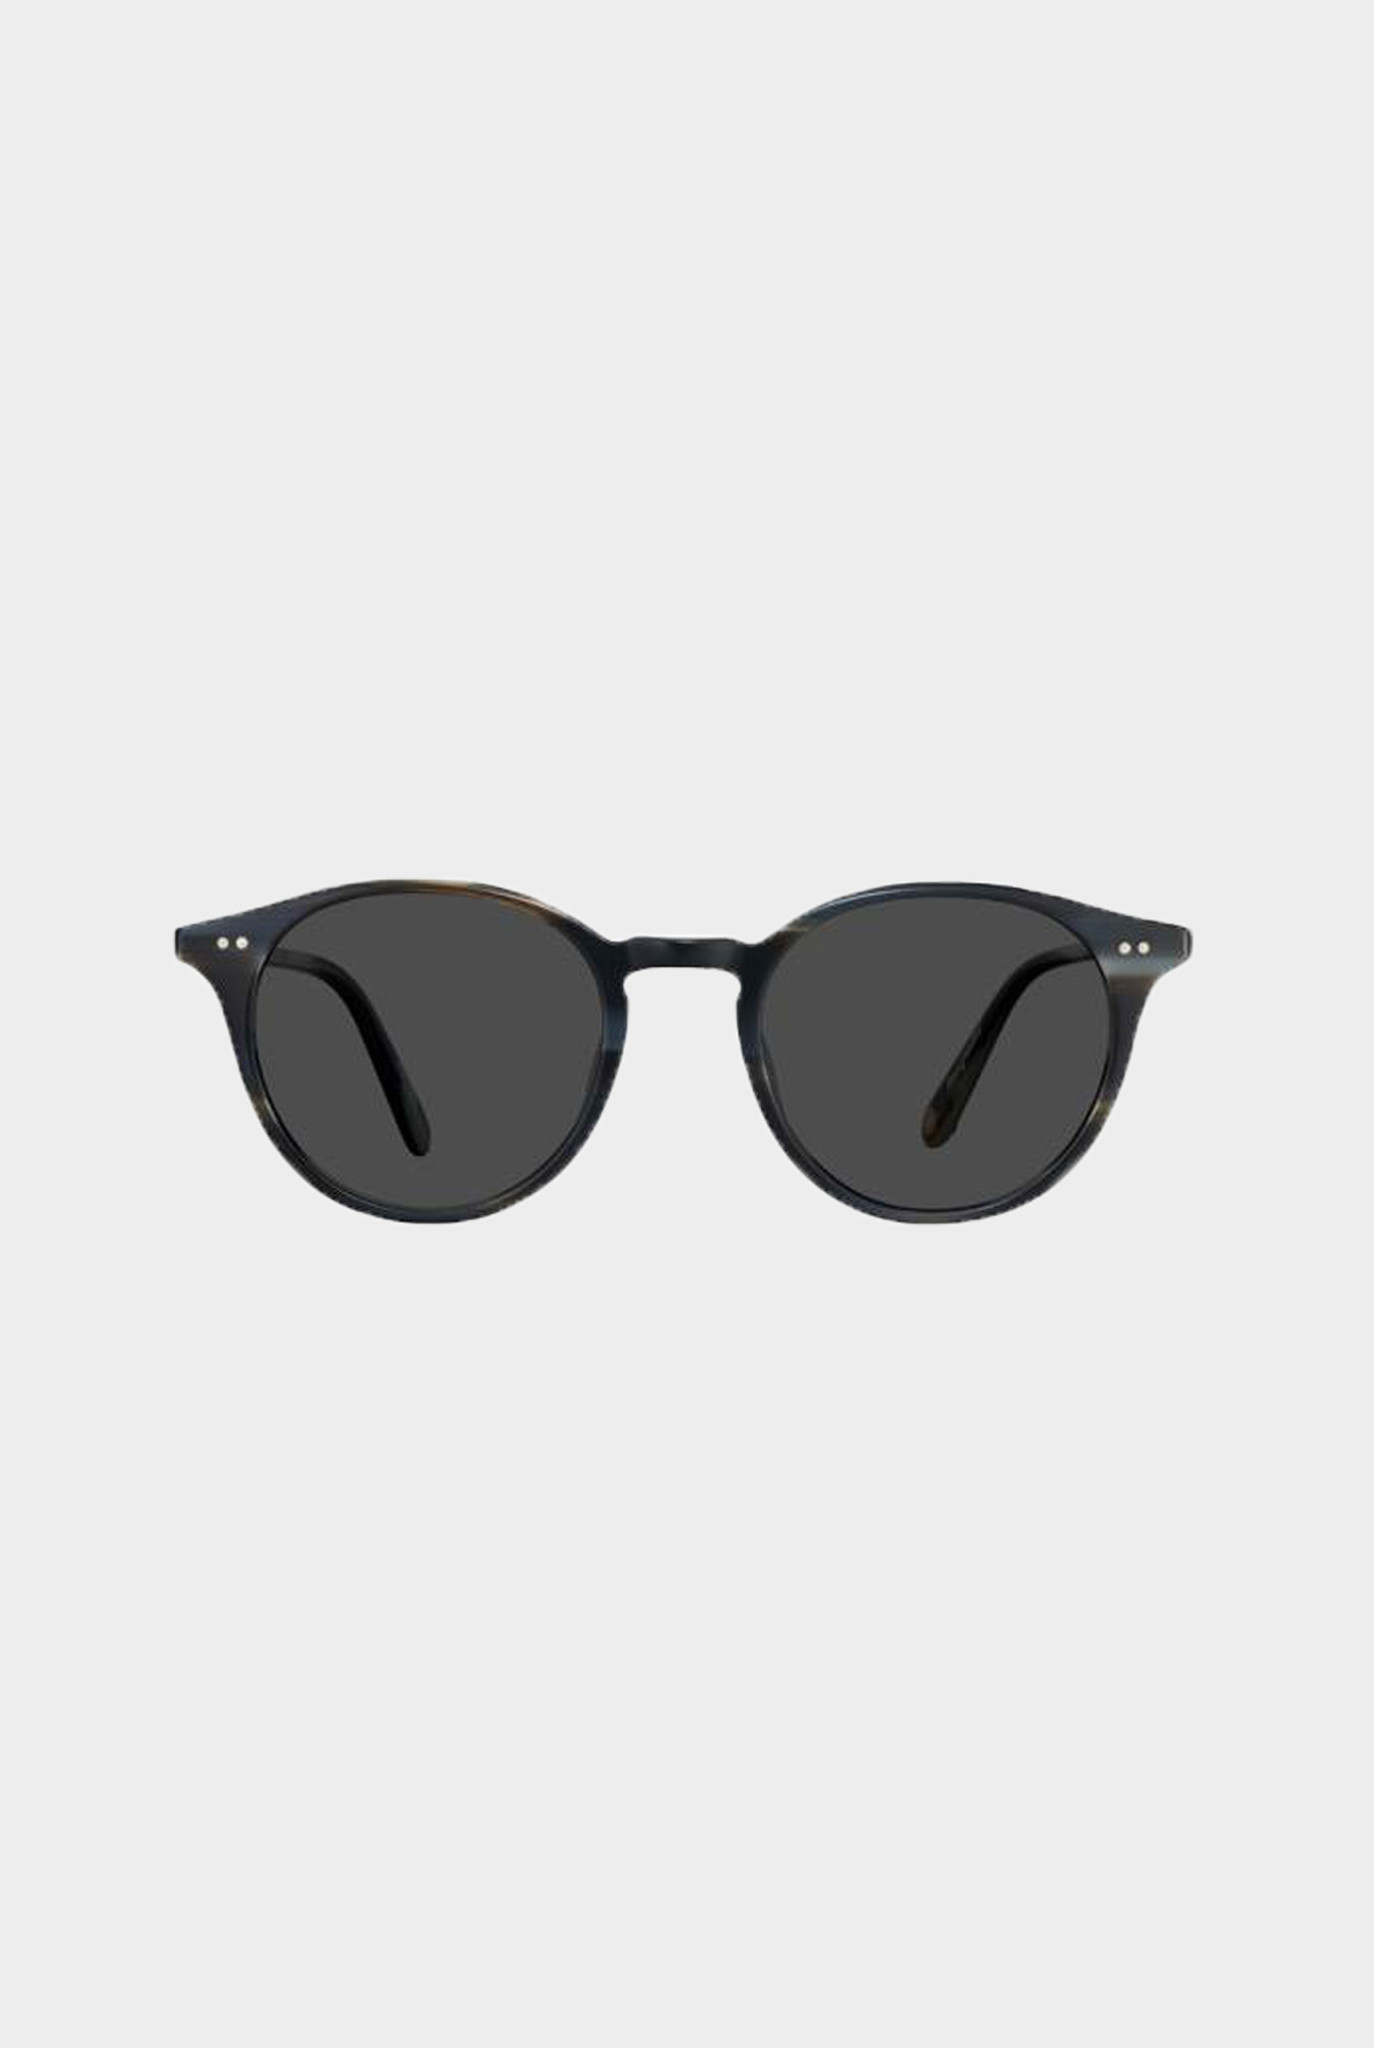 Clune sunglasses Basalt/Semi-flat Grey Black